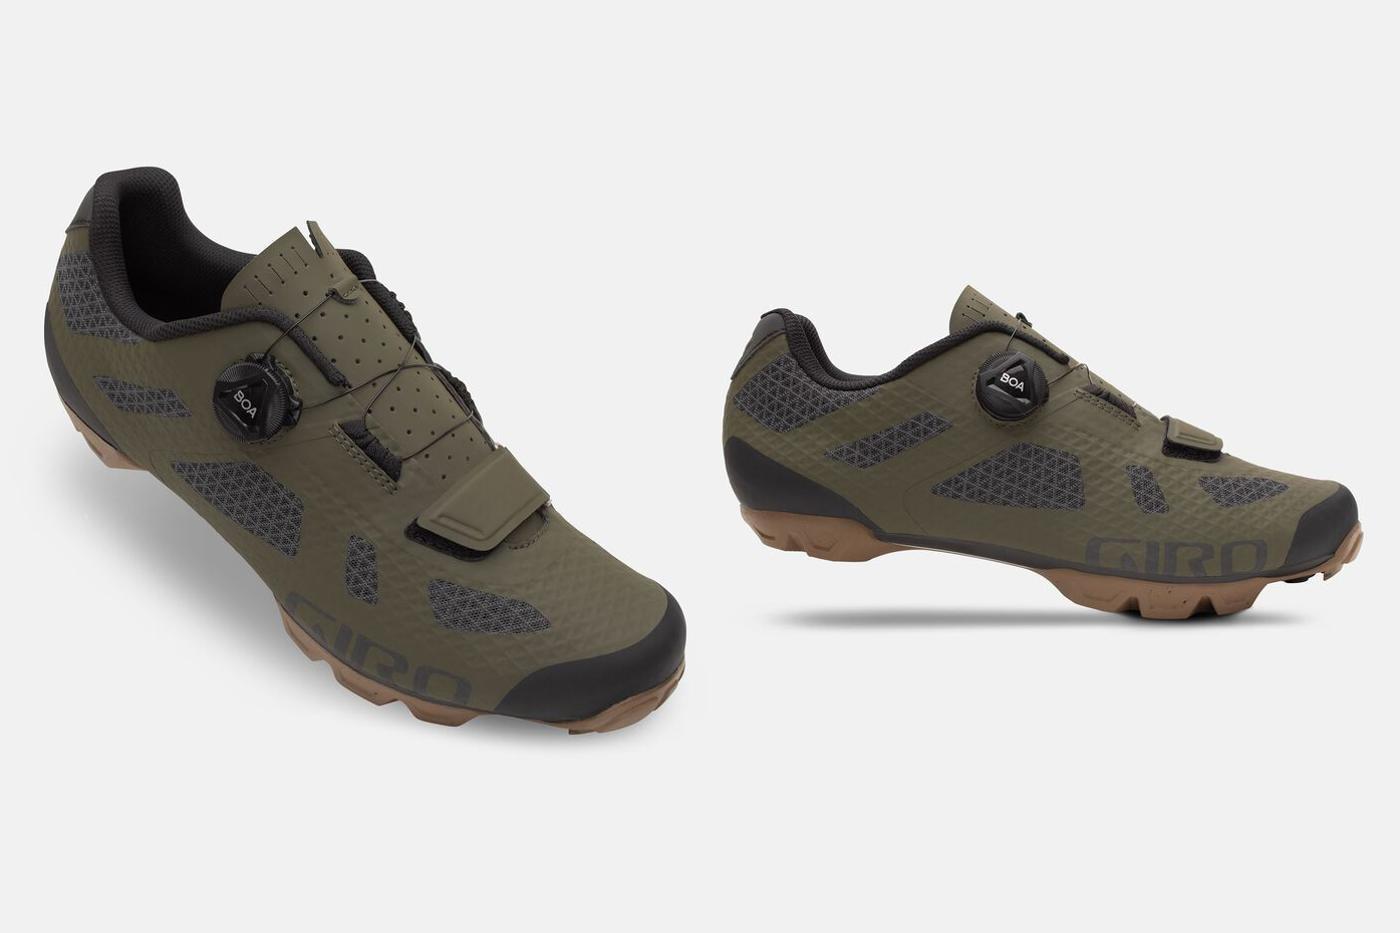 Giro: Rincon All Terrain Shoe